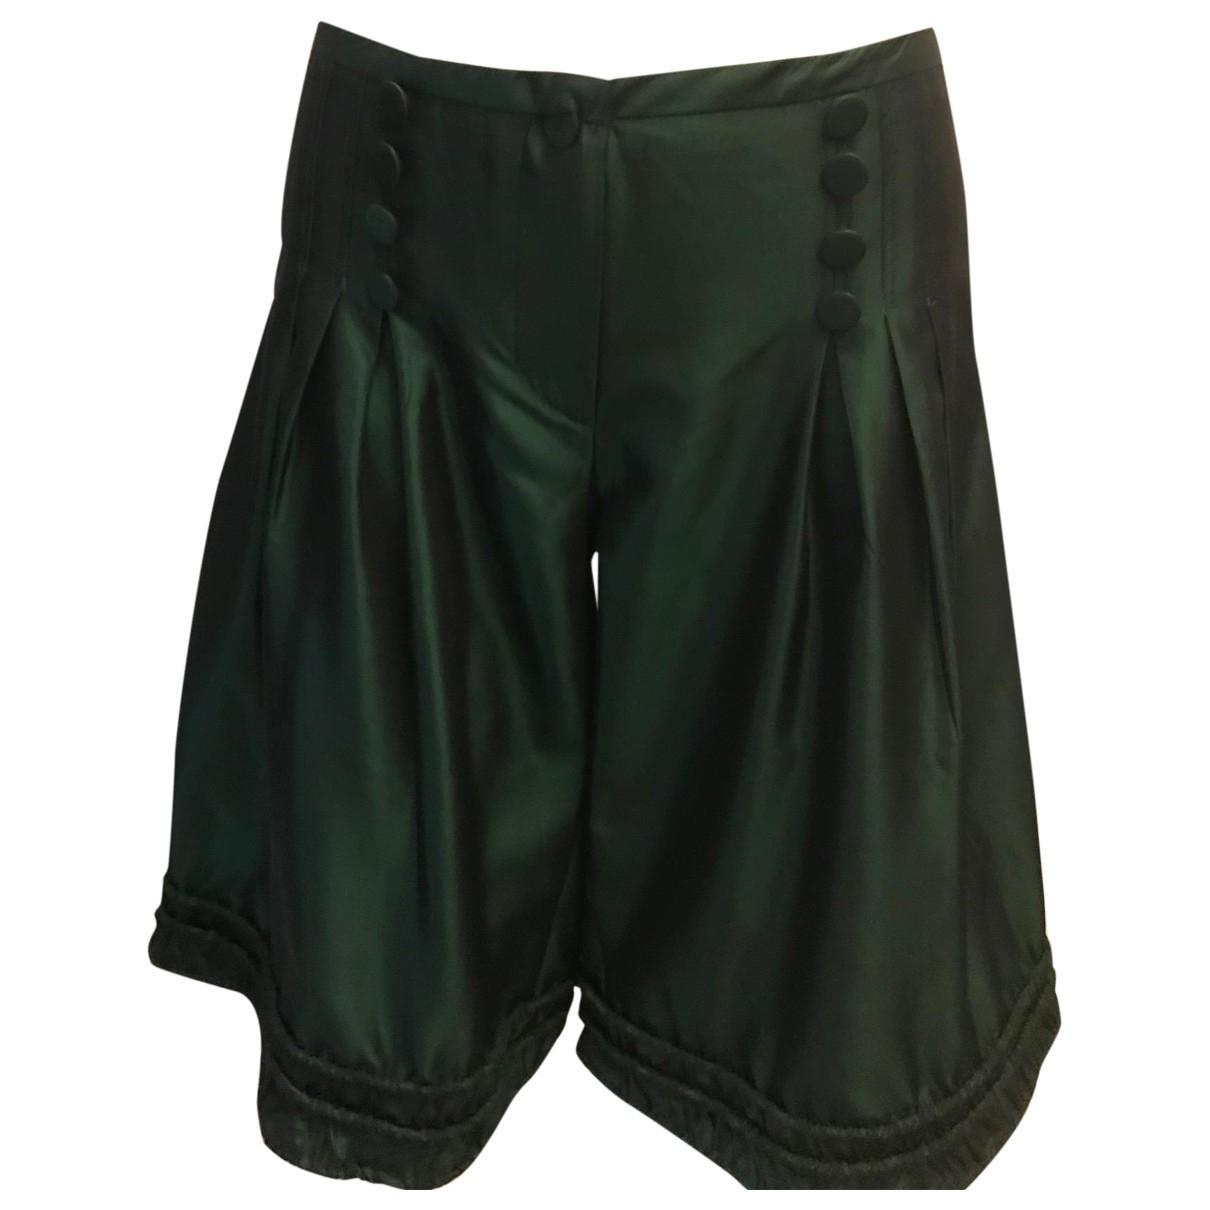 Emporio Armani \N Shorts in  Gruen Polyester